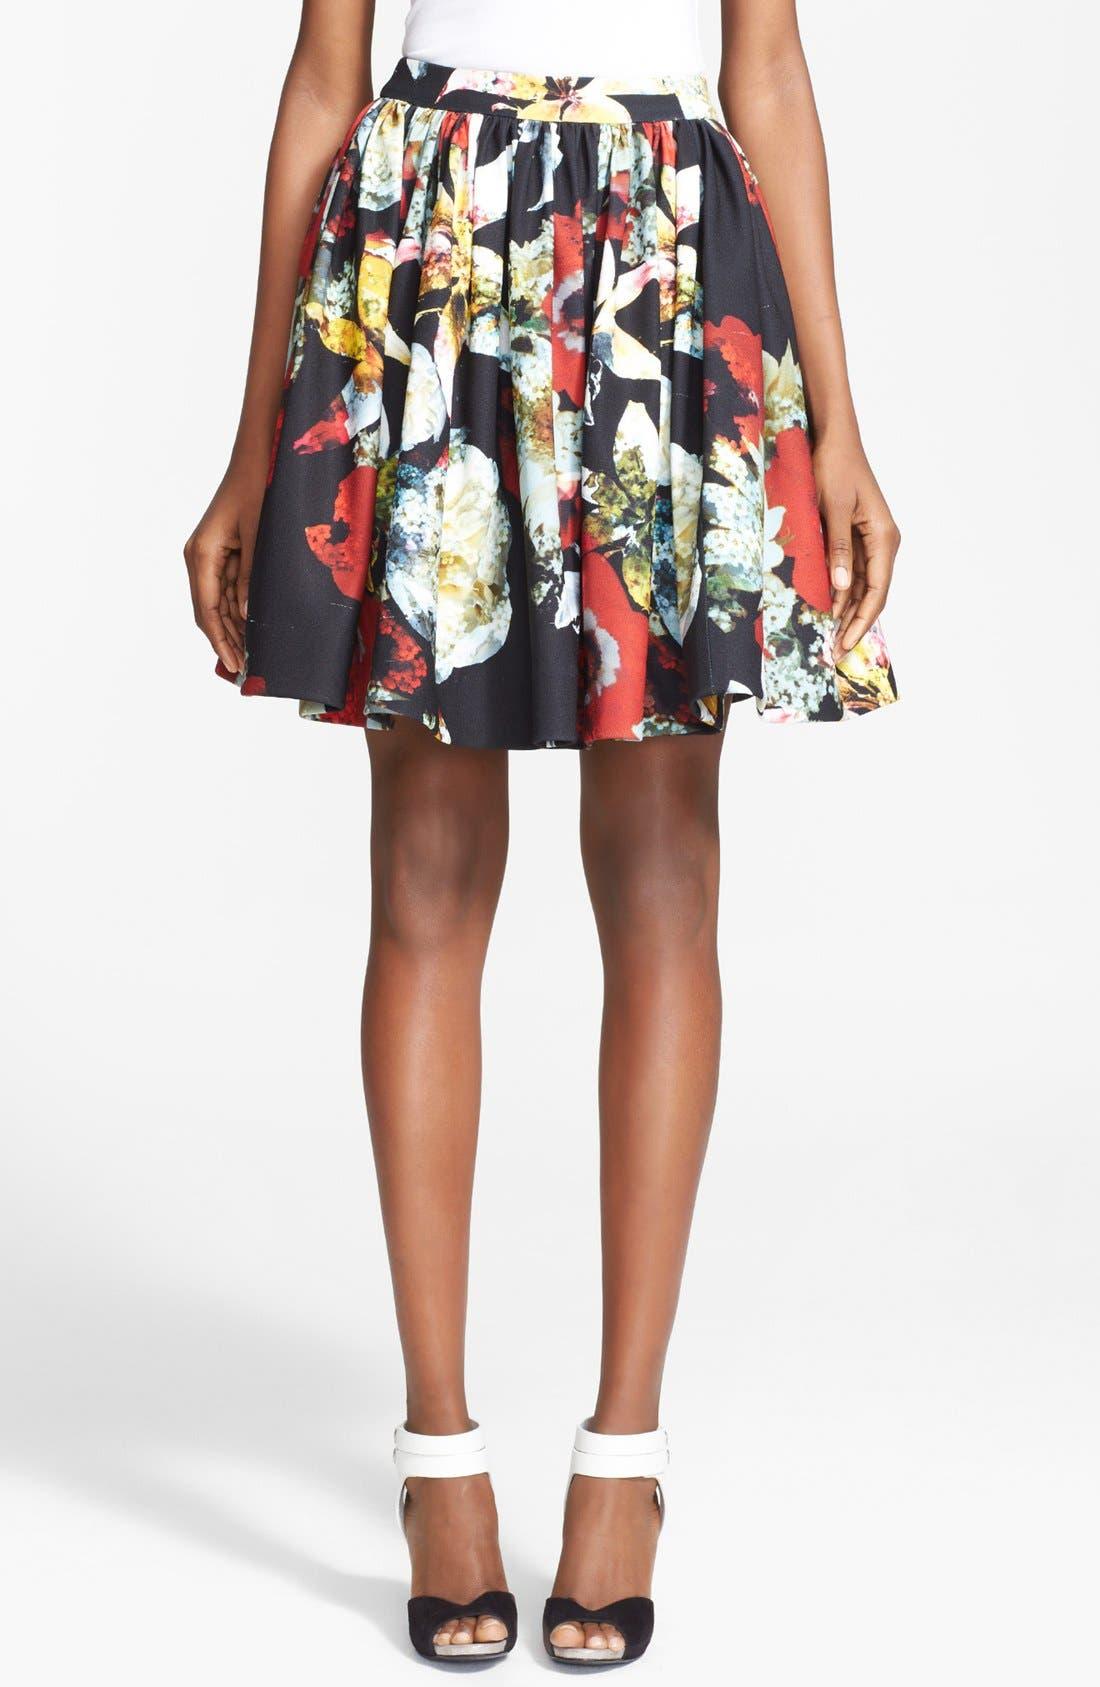 Alternate Image 1 Selected - Alice + Olivia 'Pia' Print Flared Skirt